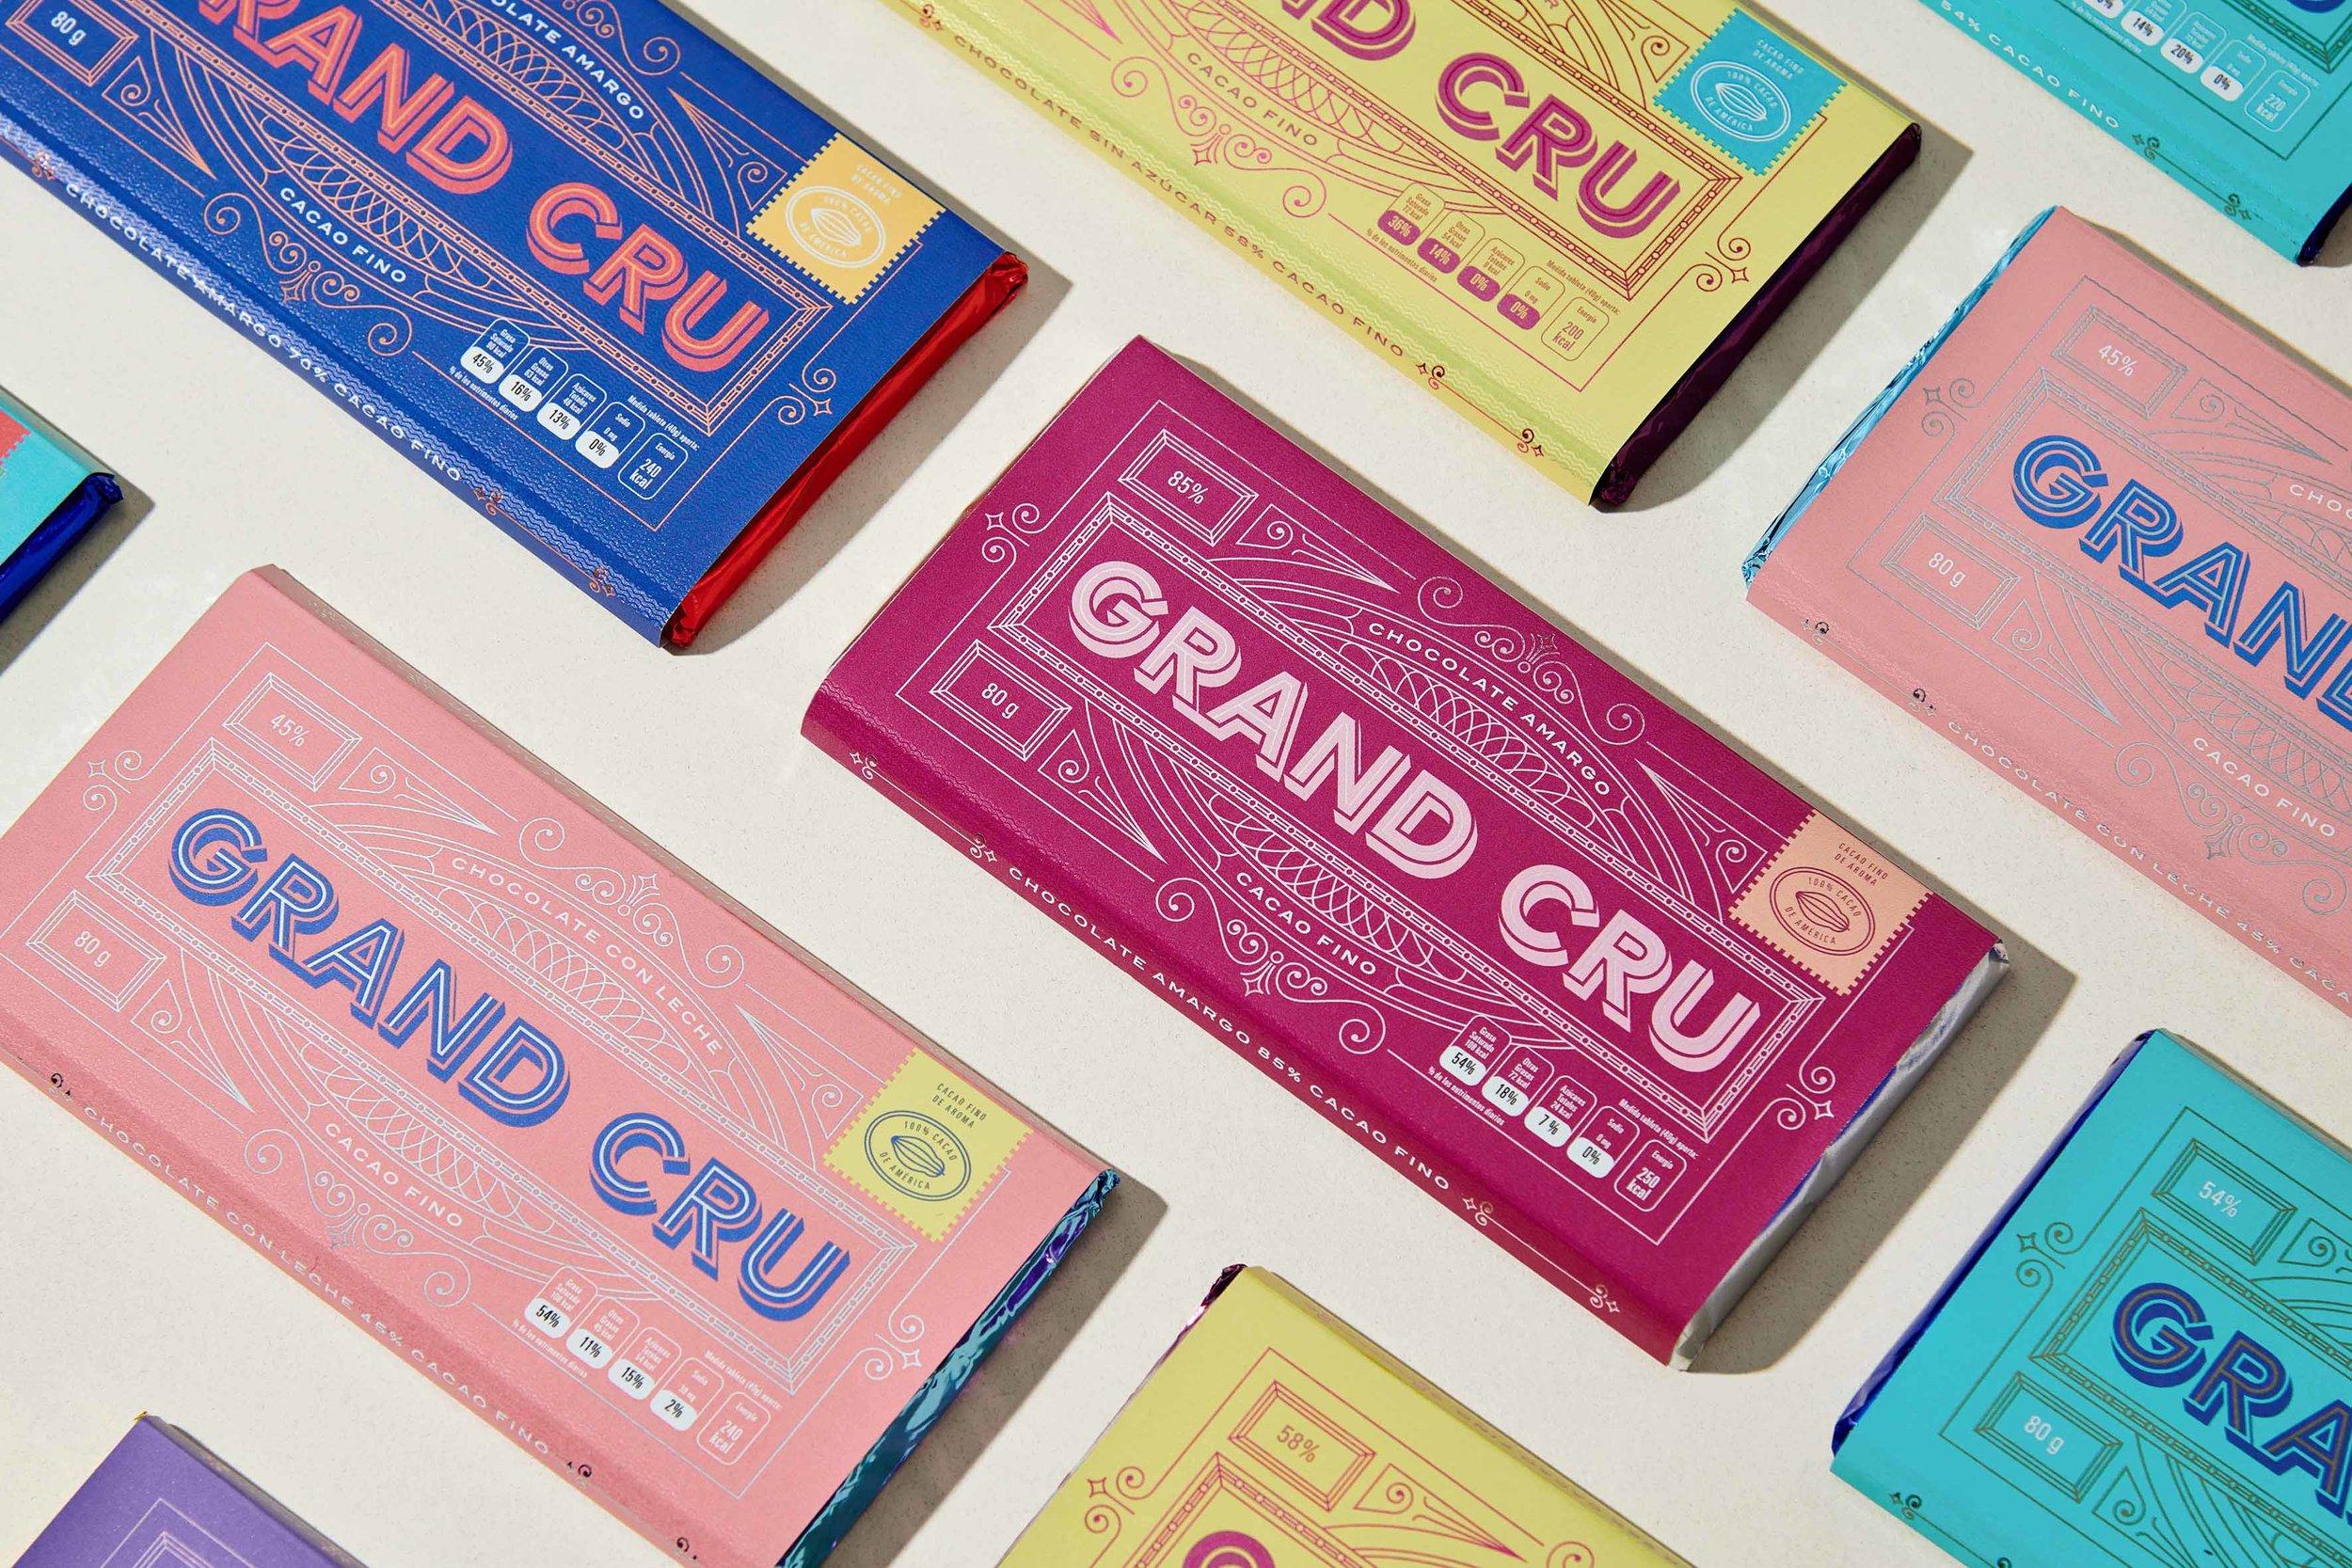 Parametro Studio – Grand Cru Chocolate